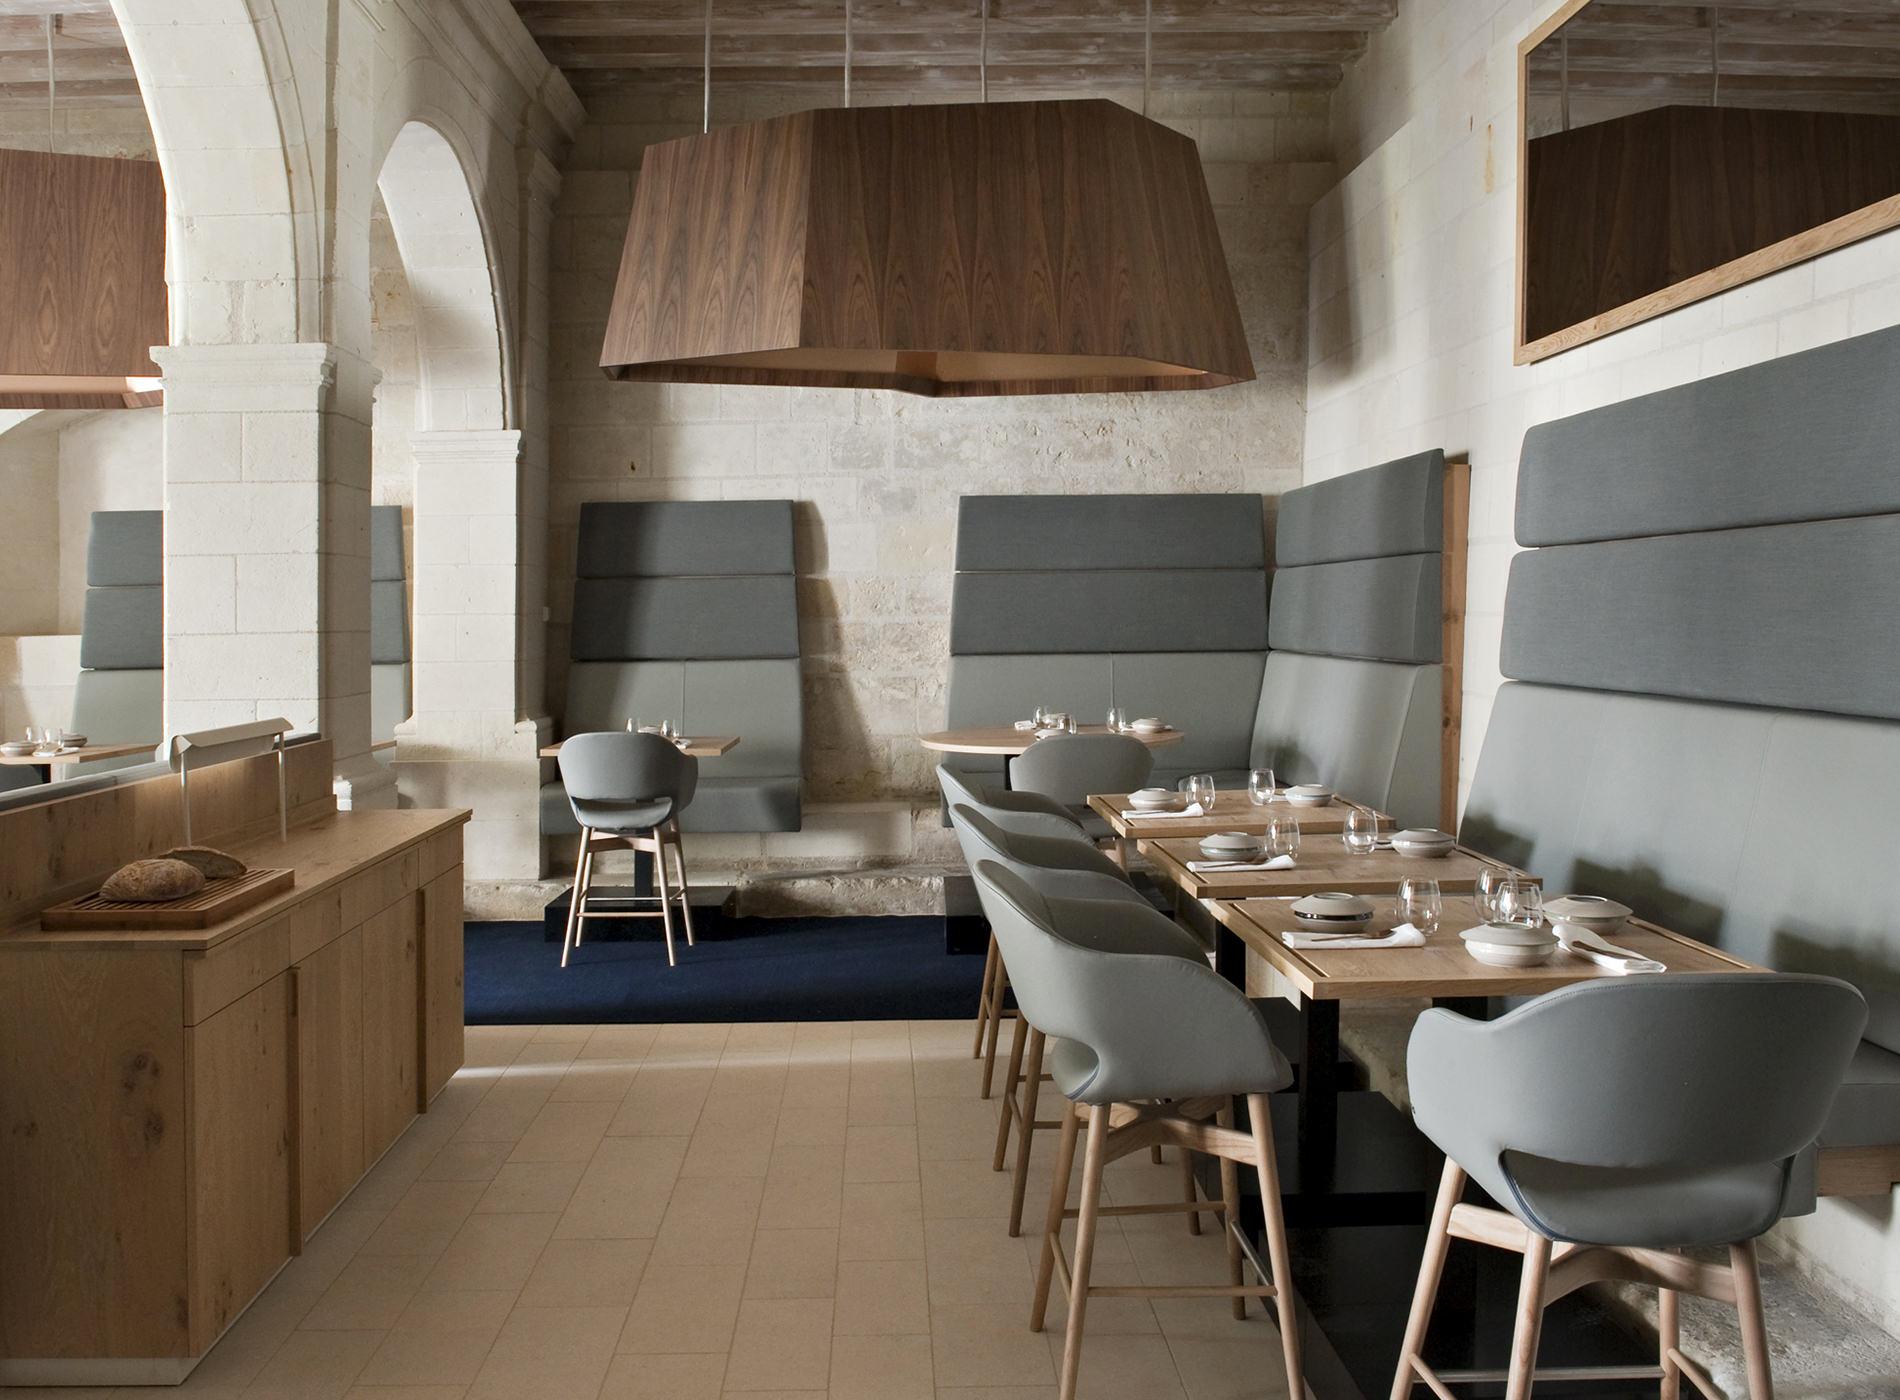 Fontevraud l'Hôtel Restaurant Design Patrick Jouin